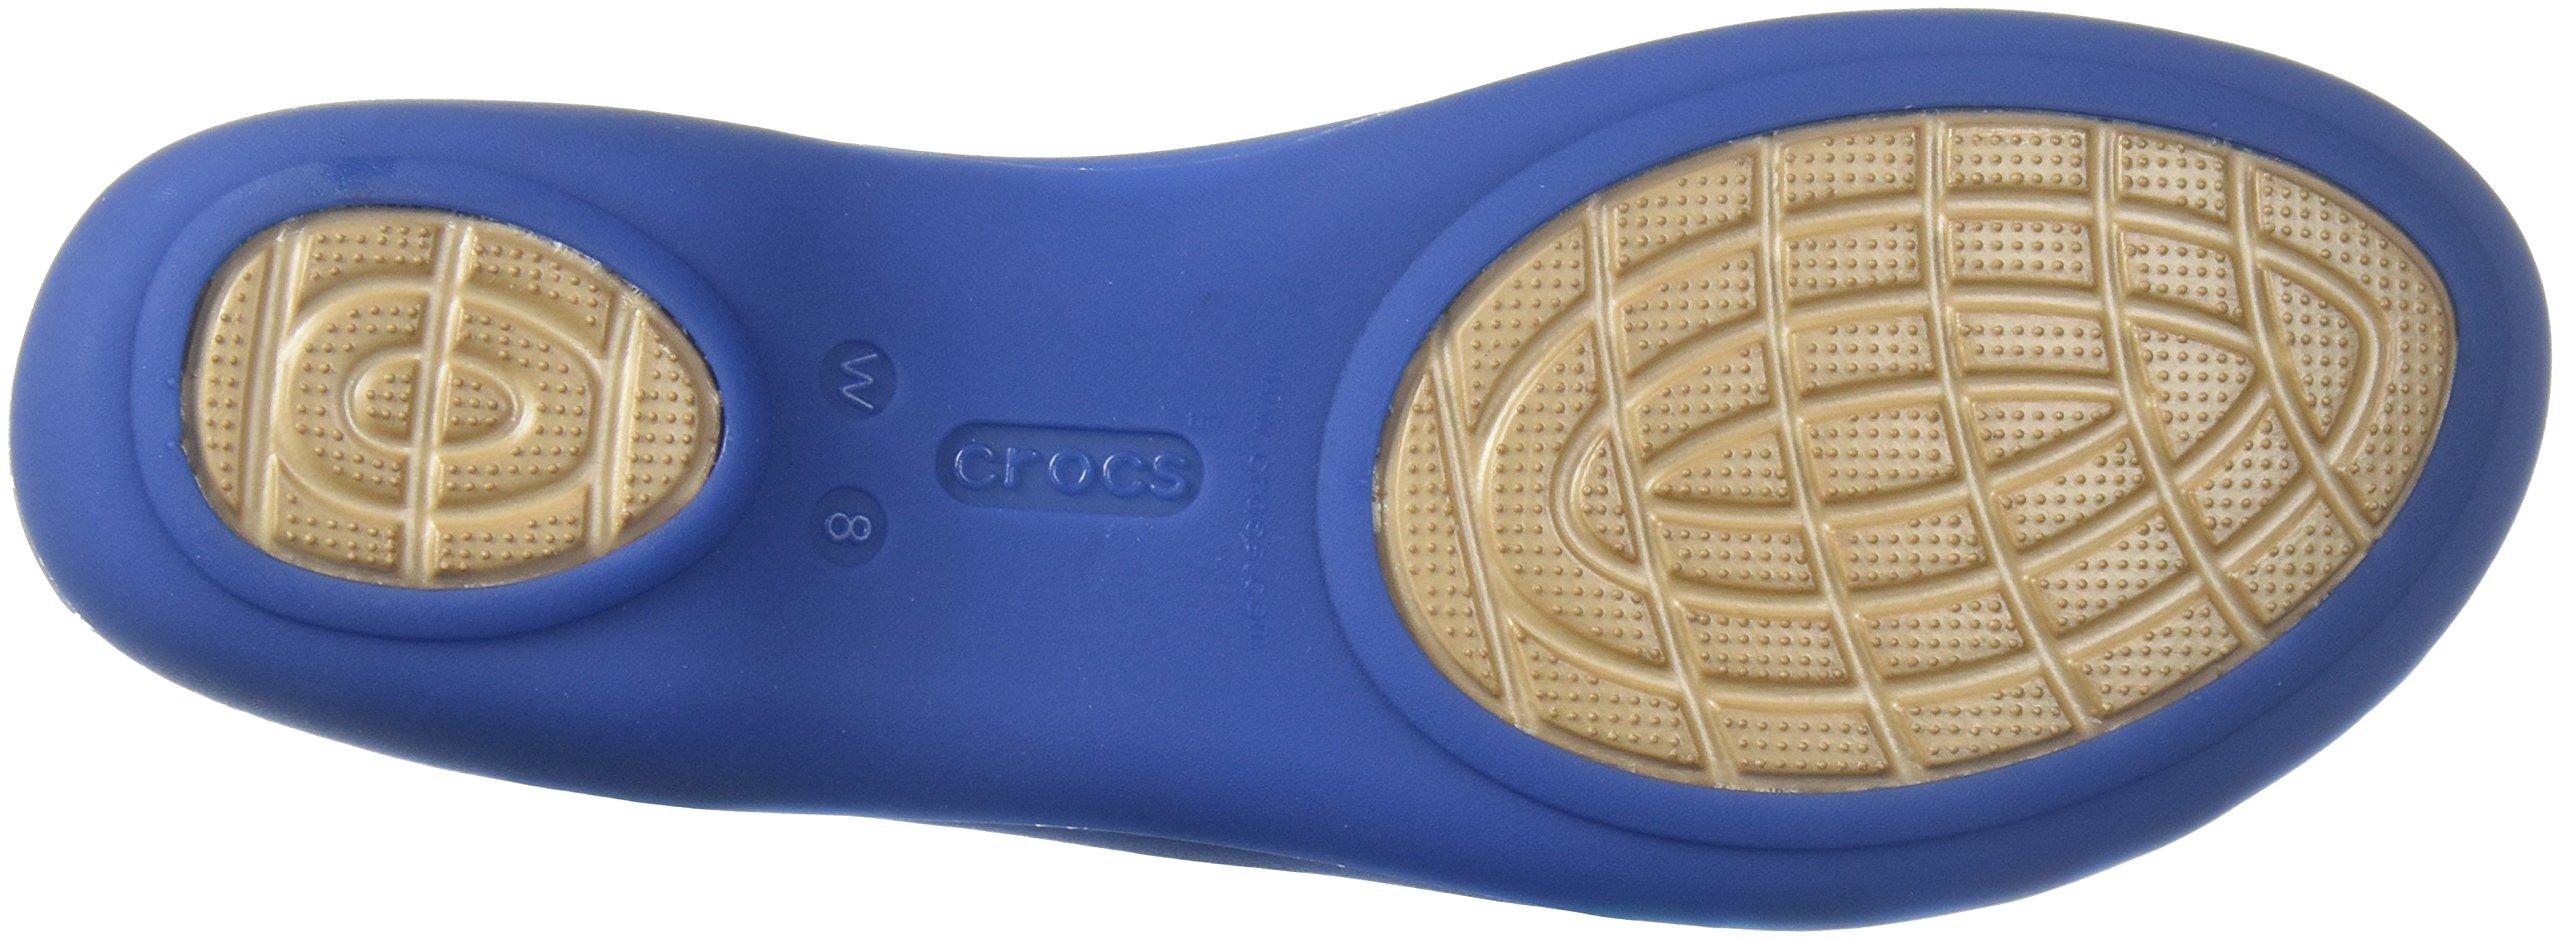 best cheap 8e658 59695 Crocs Women's Isabella Huarache 2 Flat W Sandal, Blue Jean ...